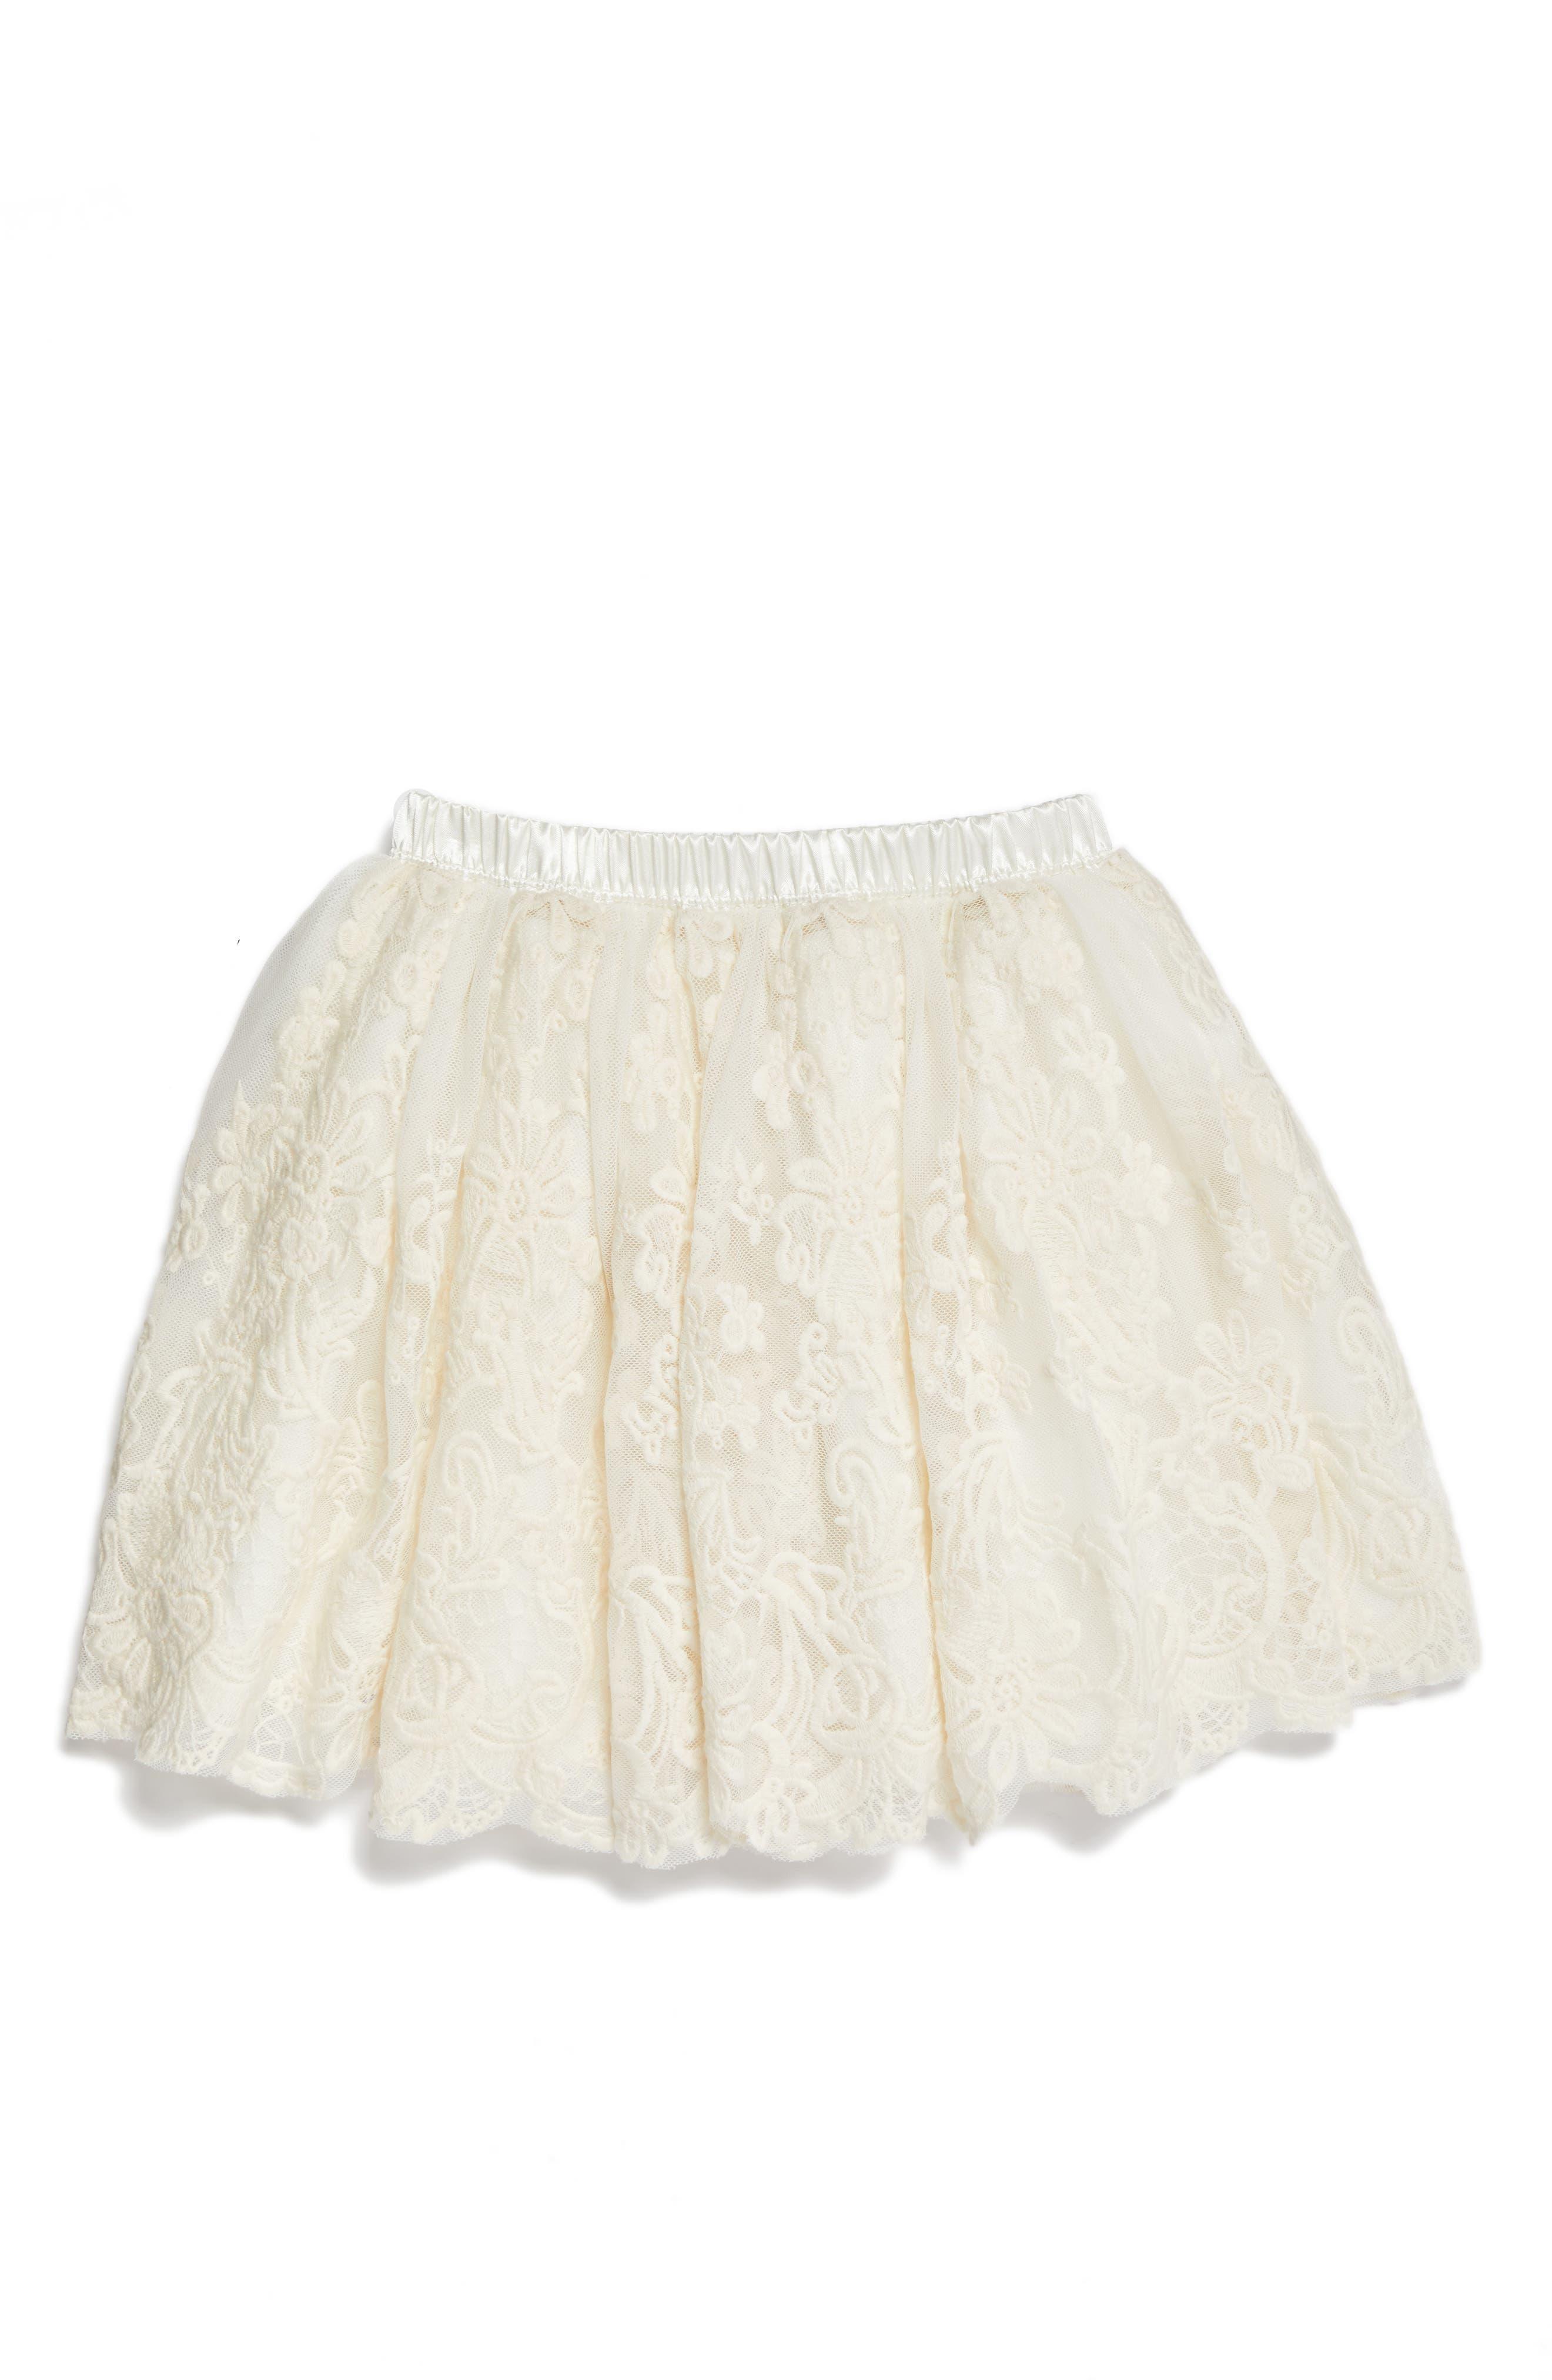 POPATU Lace Tutu Skirt, Main, color, IVORY